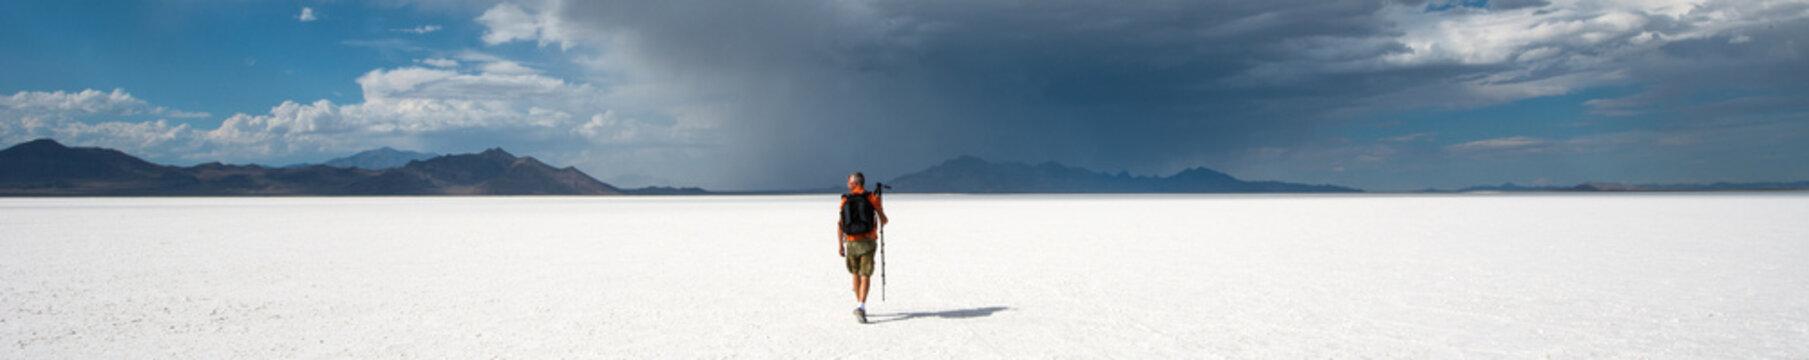 Photographer at Bonneville salt flats, Utah